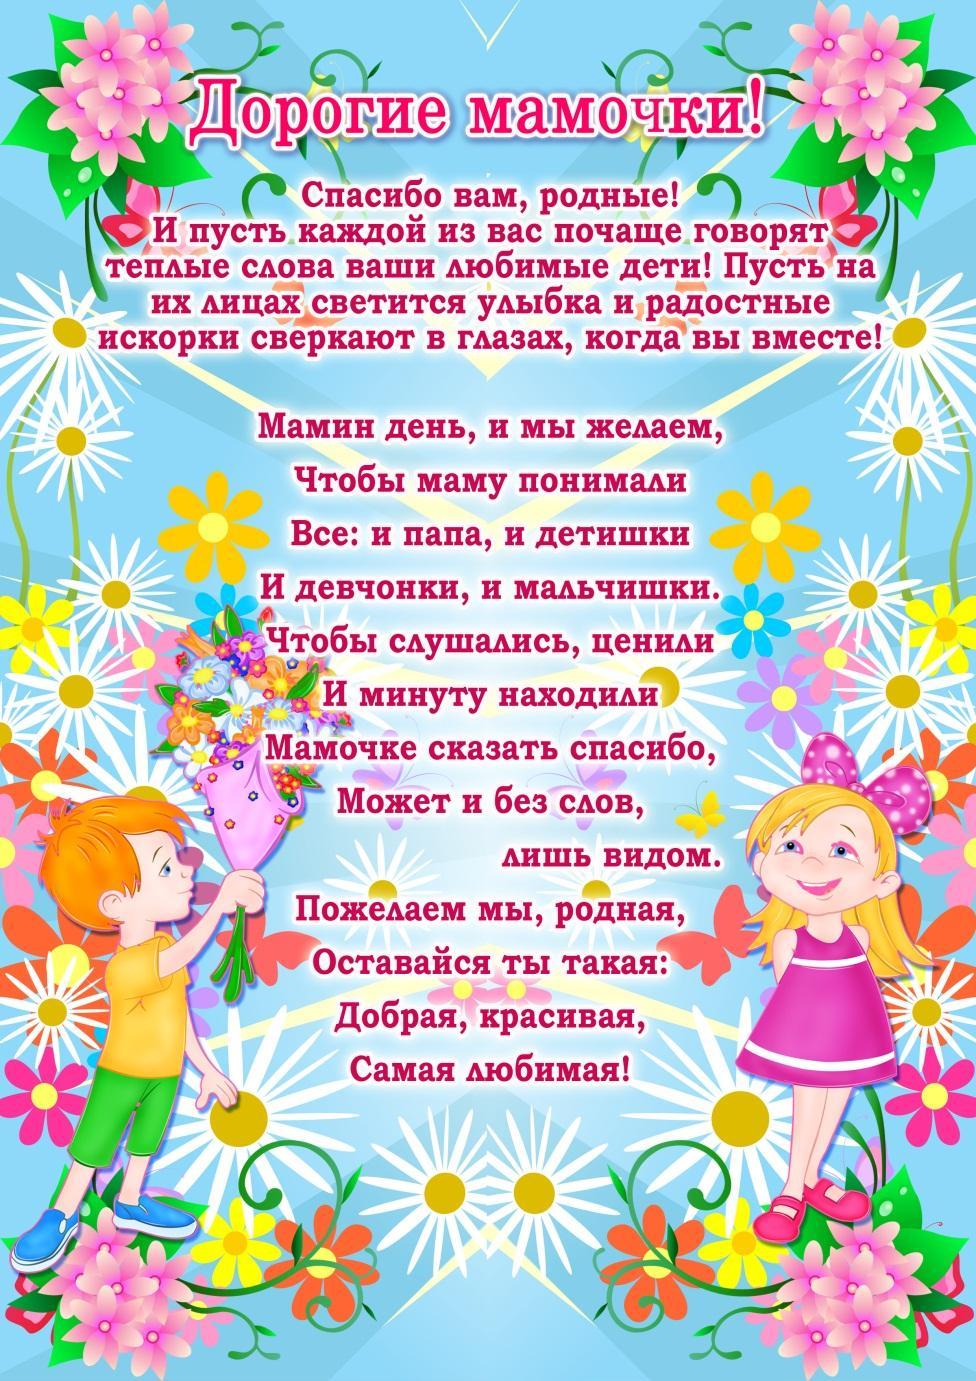 http://menjinskazosh.at.ua/novij/44.jpg